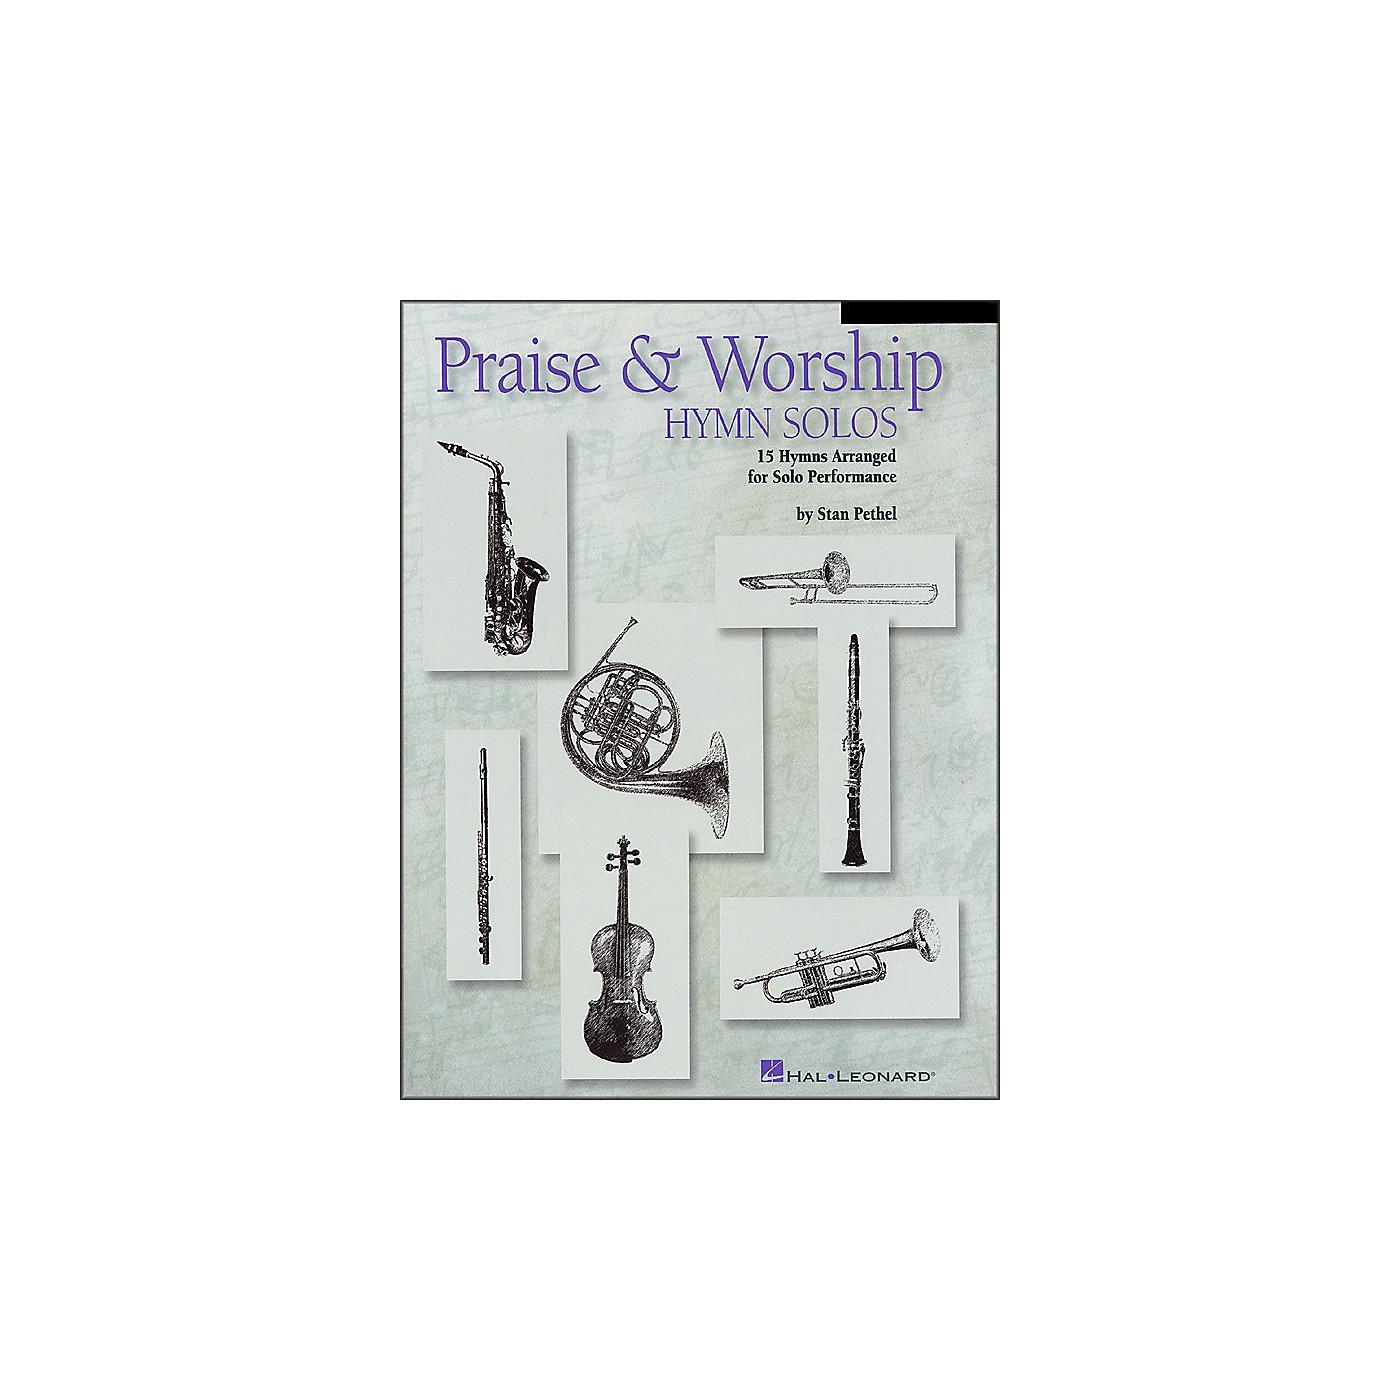 Hal Leonard Praise & Worship Hymn Solos - Trombone/Baritone Book/CD Package thumbnail